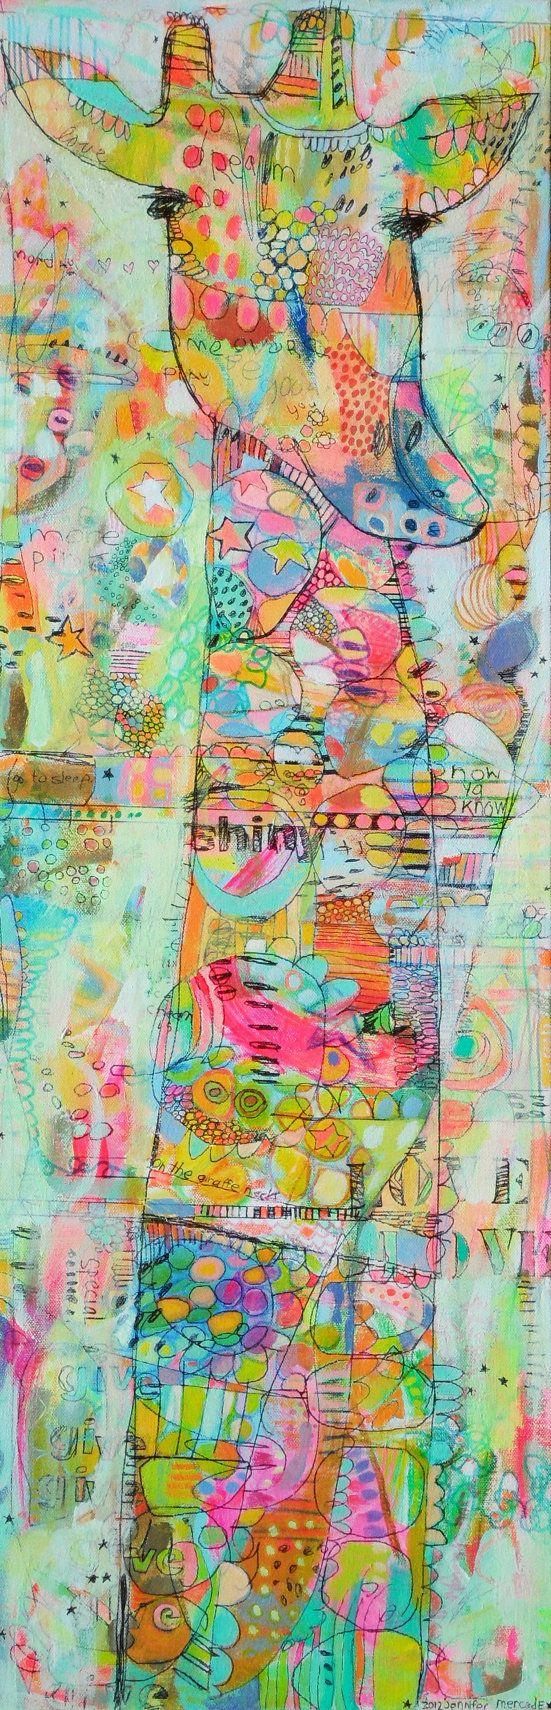 Sweet G-Raff Canvas Print by Jennifer Mercede 32x10in